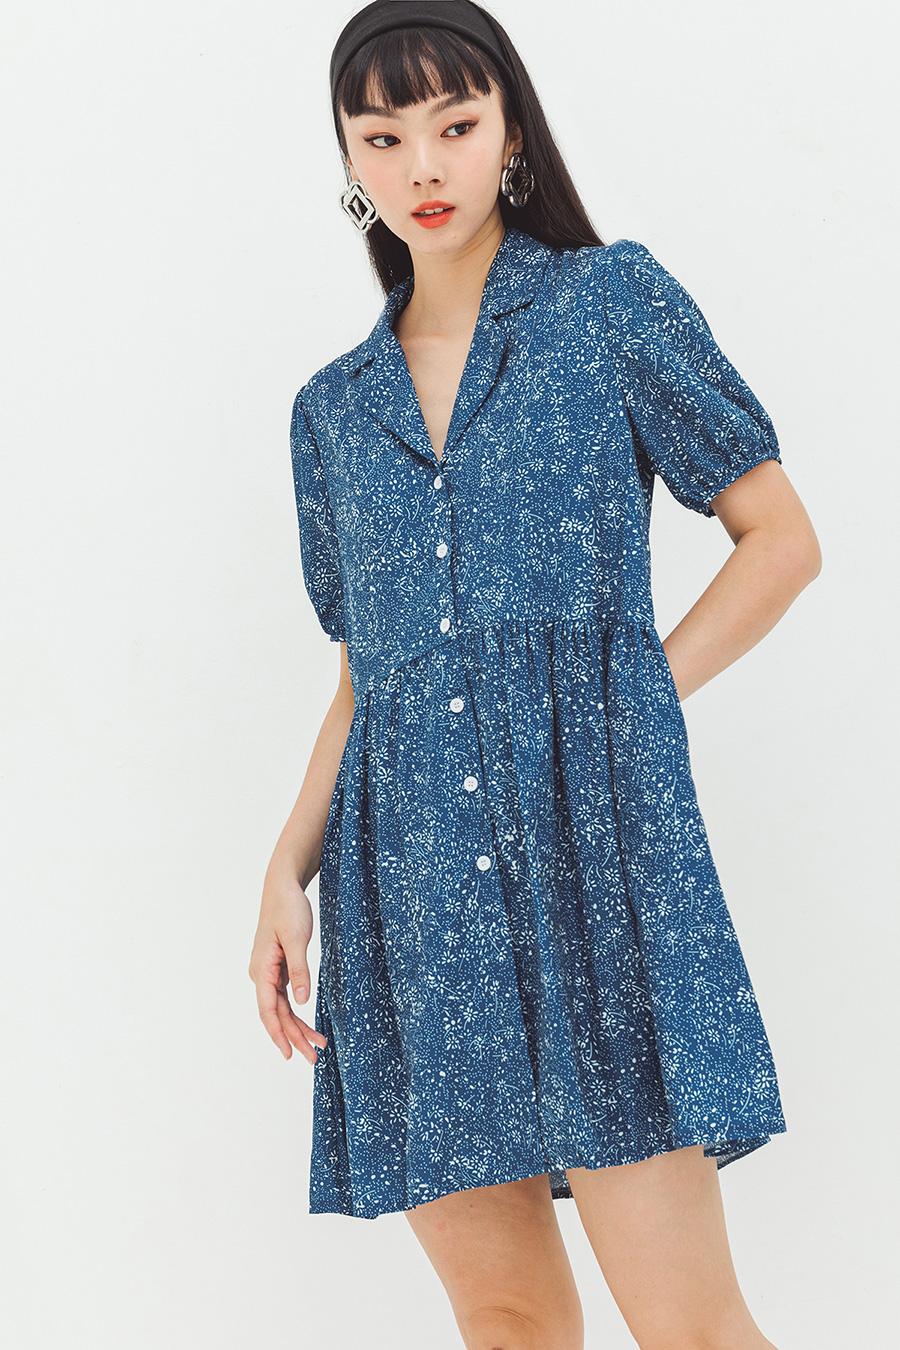 MAEVA DRESS - BLEU FLEUR